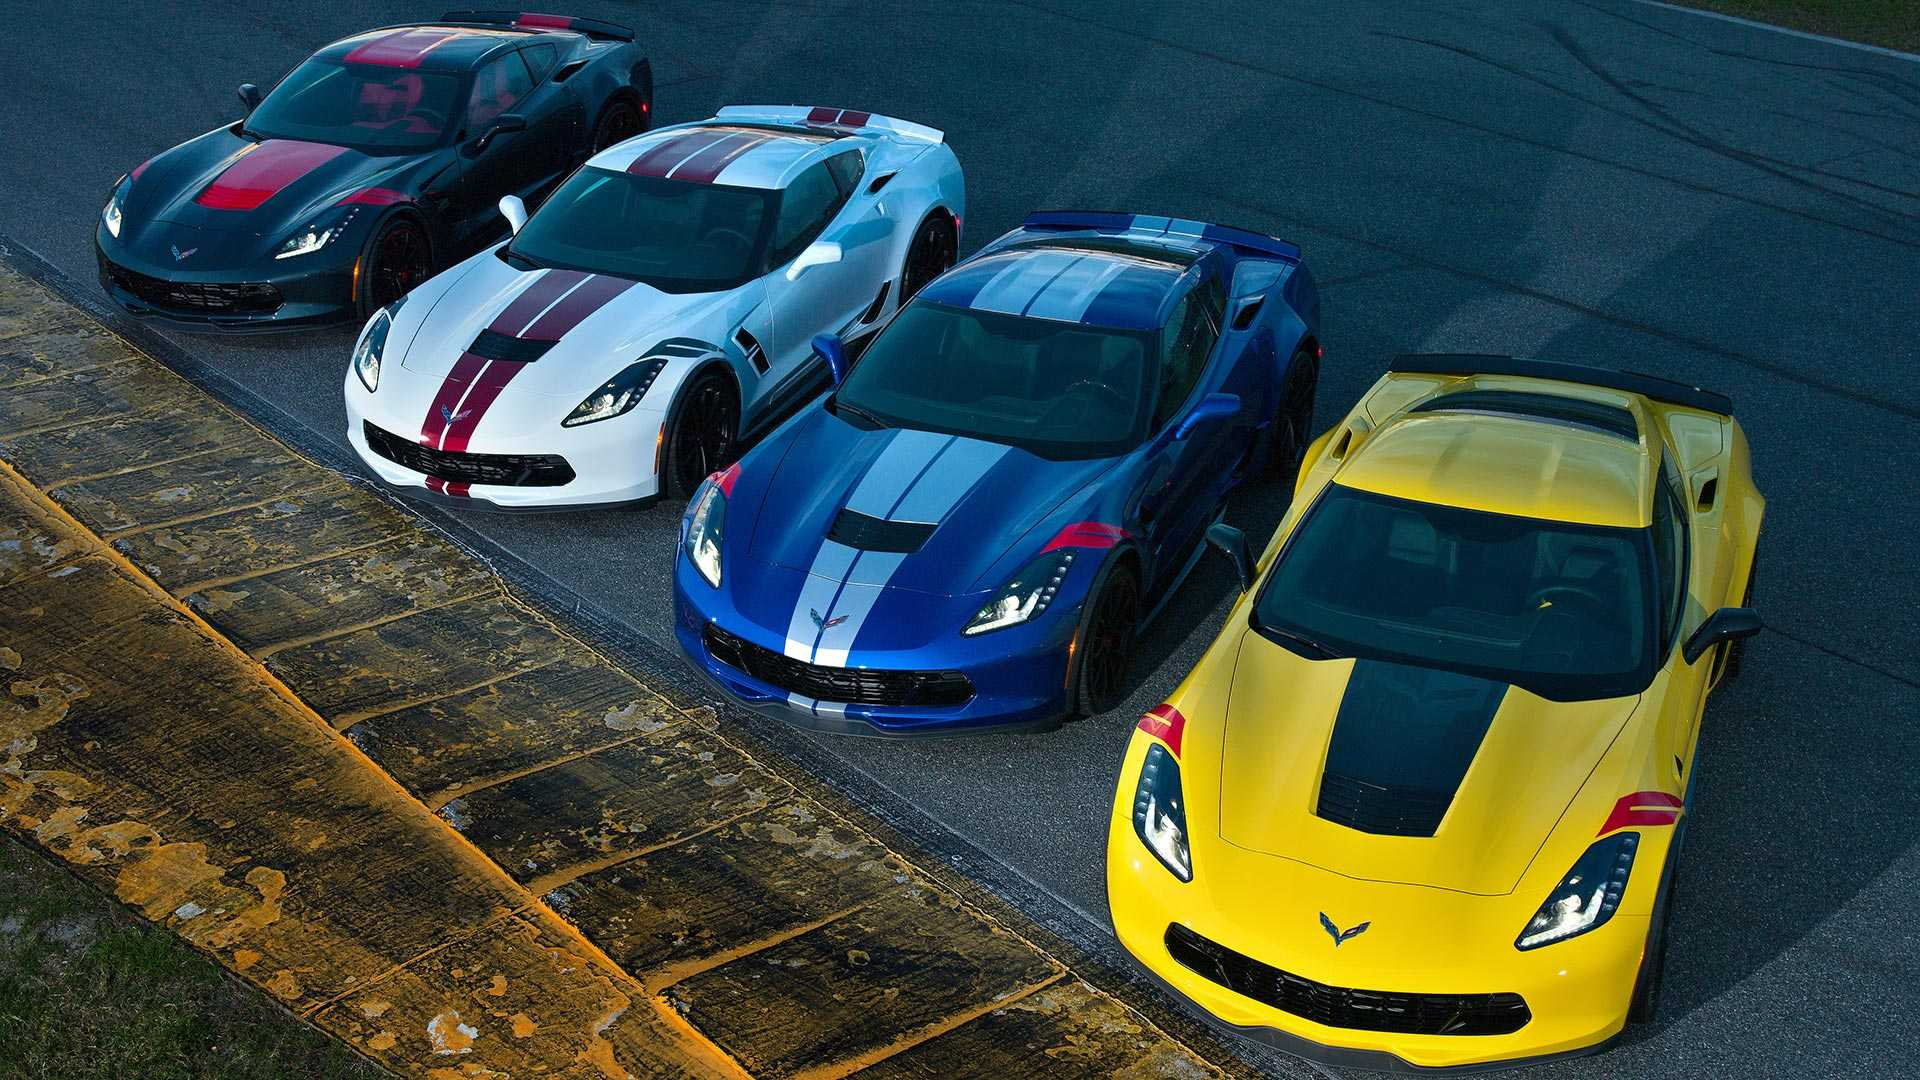 2019_Chevrolet_Corvette_Drivers_Series_Editions_0006